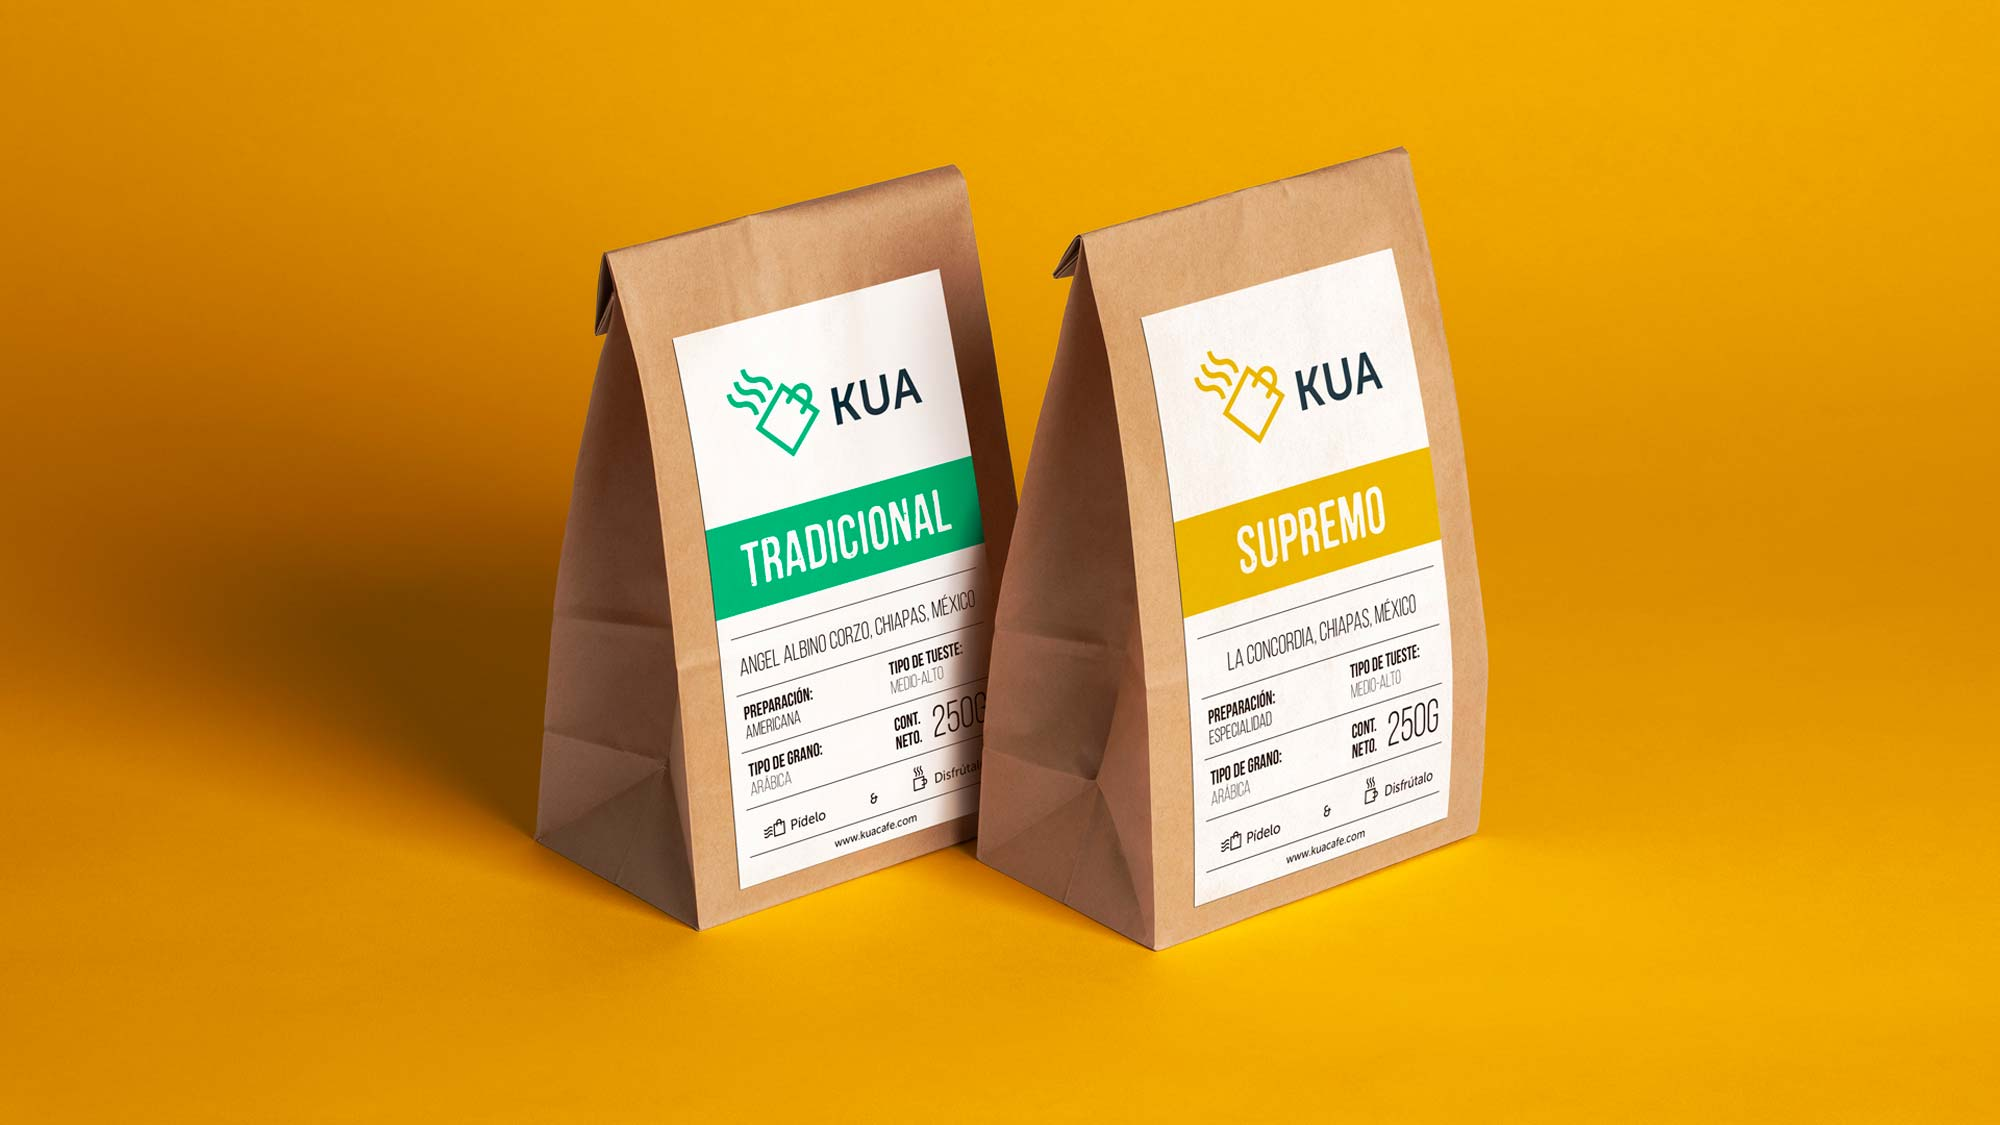 boom-agencia-marketing-digital-branding-kua-cafe-tienda-online-logo-bolsa-cafe-brandeada